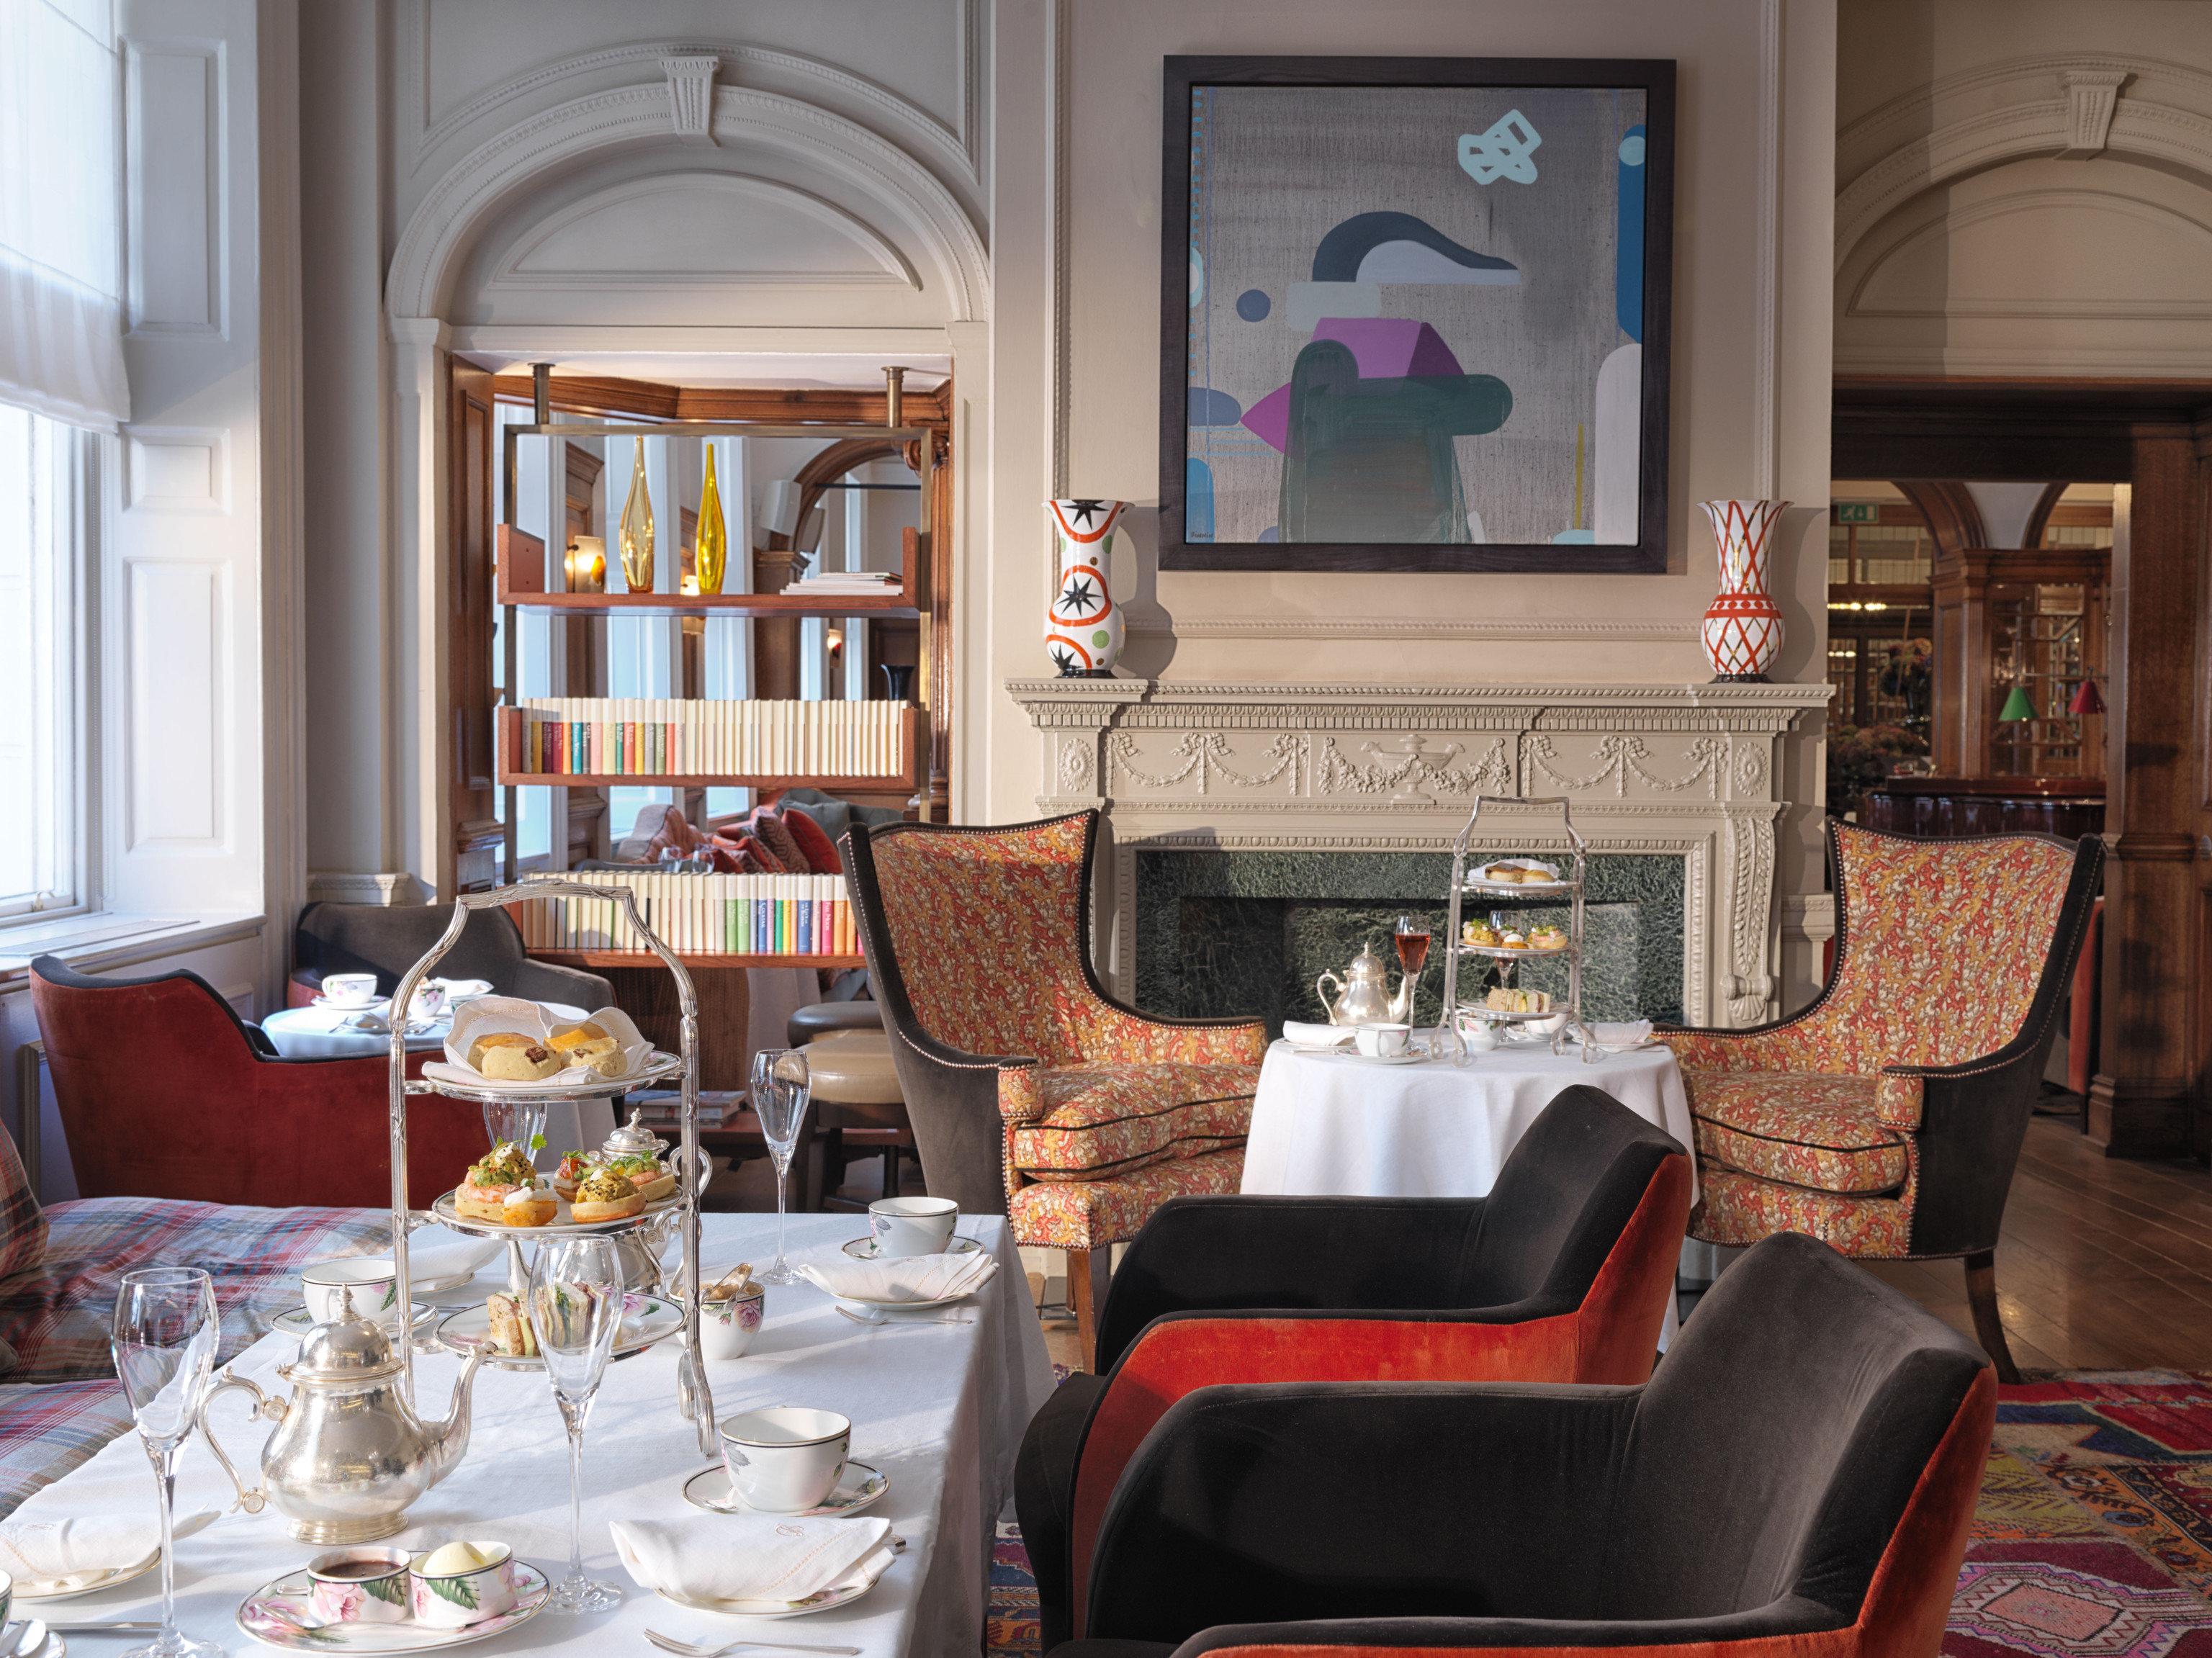 Food + Drink Hotels London Luxury Travel table indoor room window living room home dining room interior design estate Dining